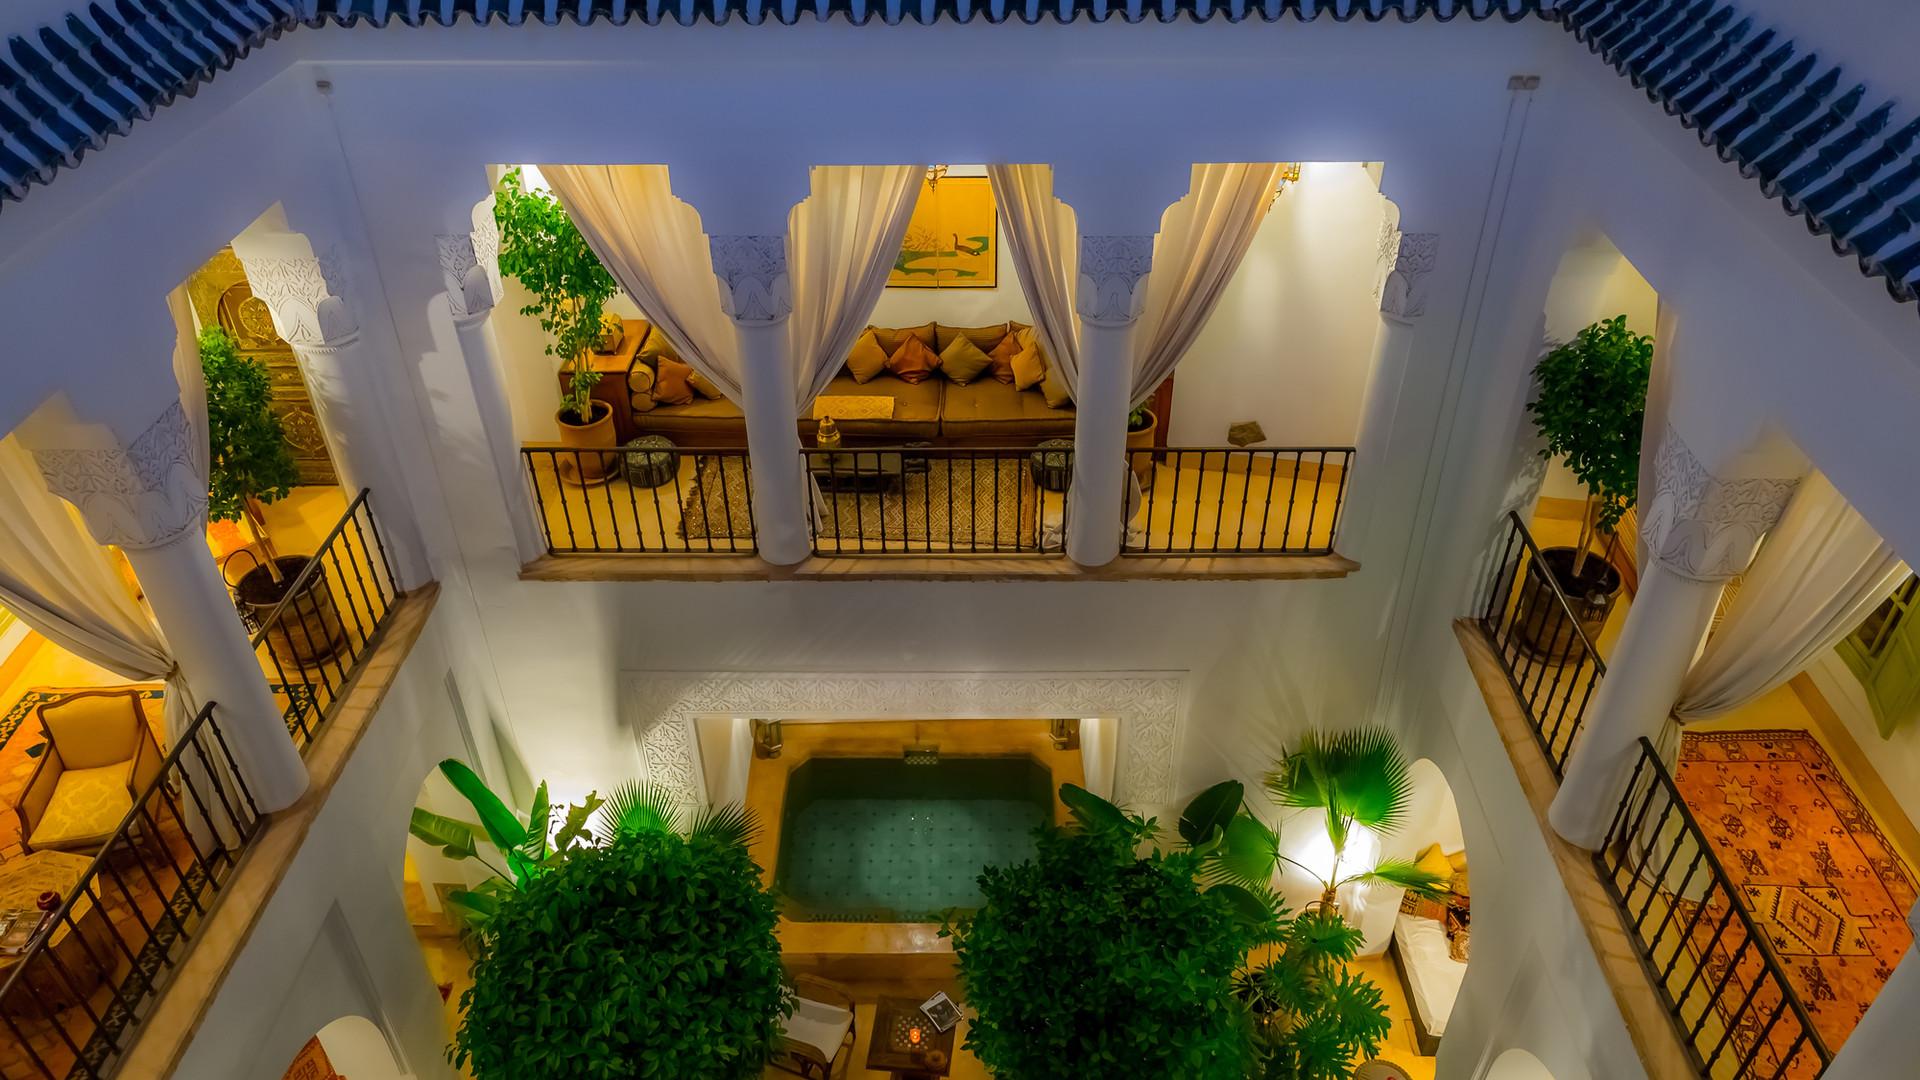 Court intérieur Riad Camilia vu du rooftop - Marrakech